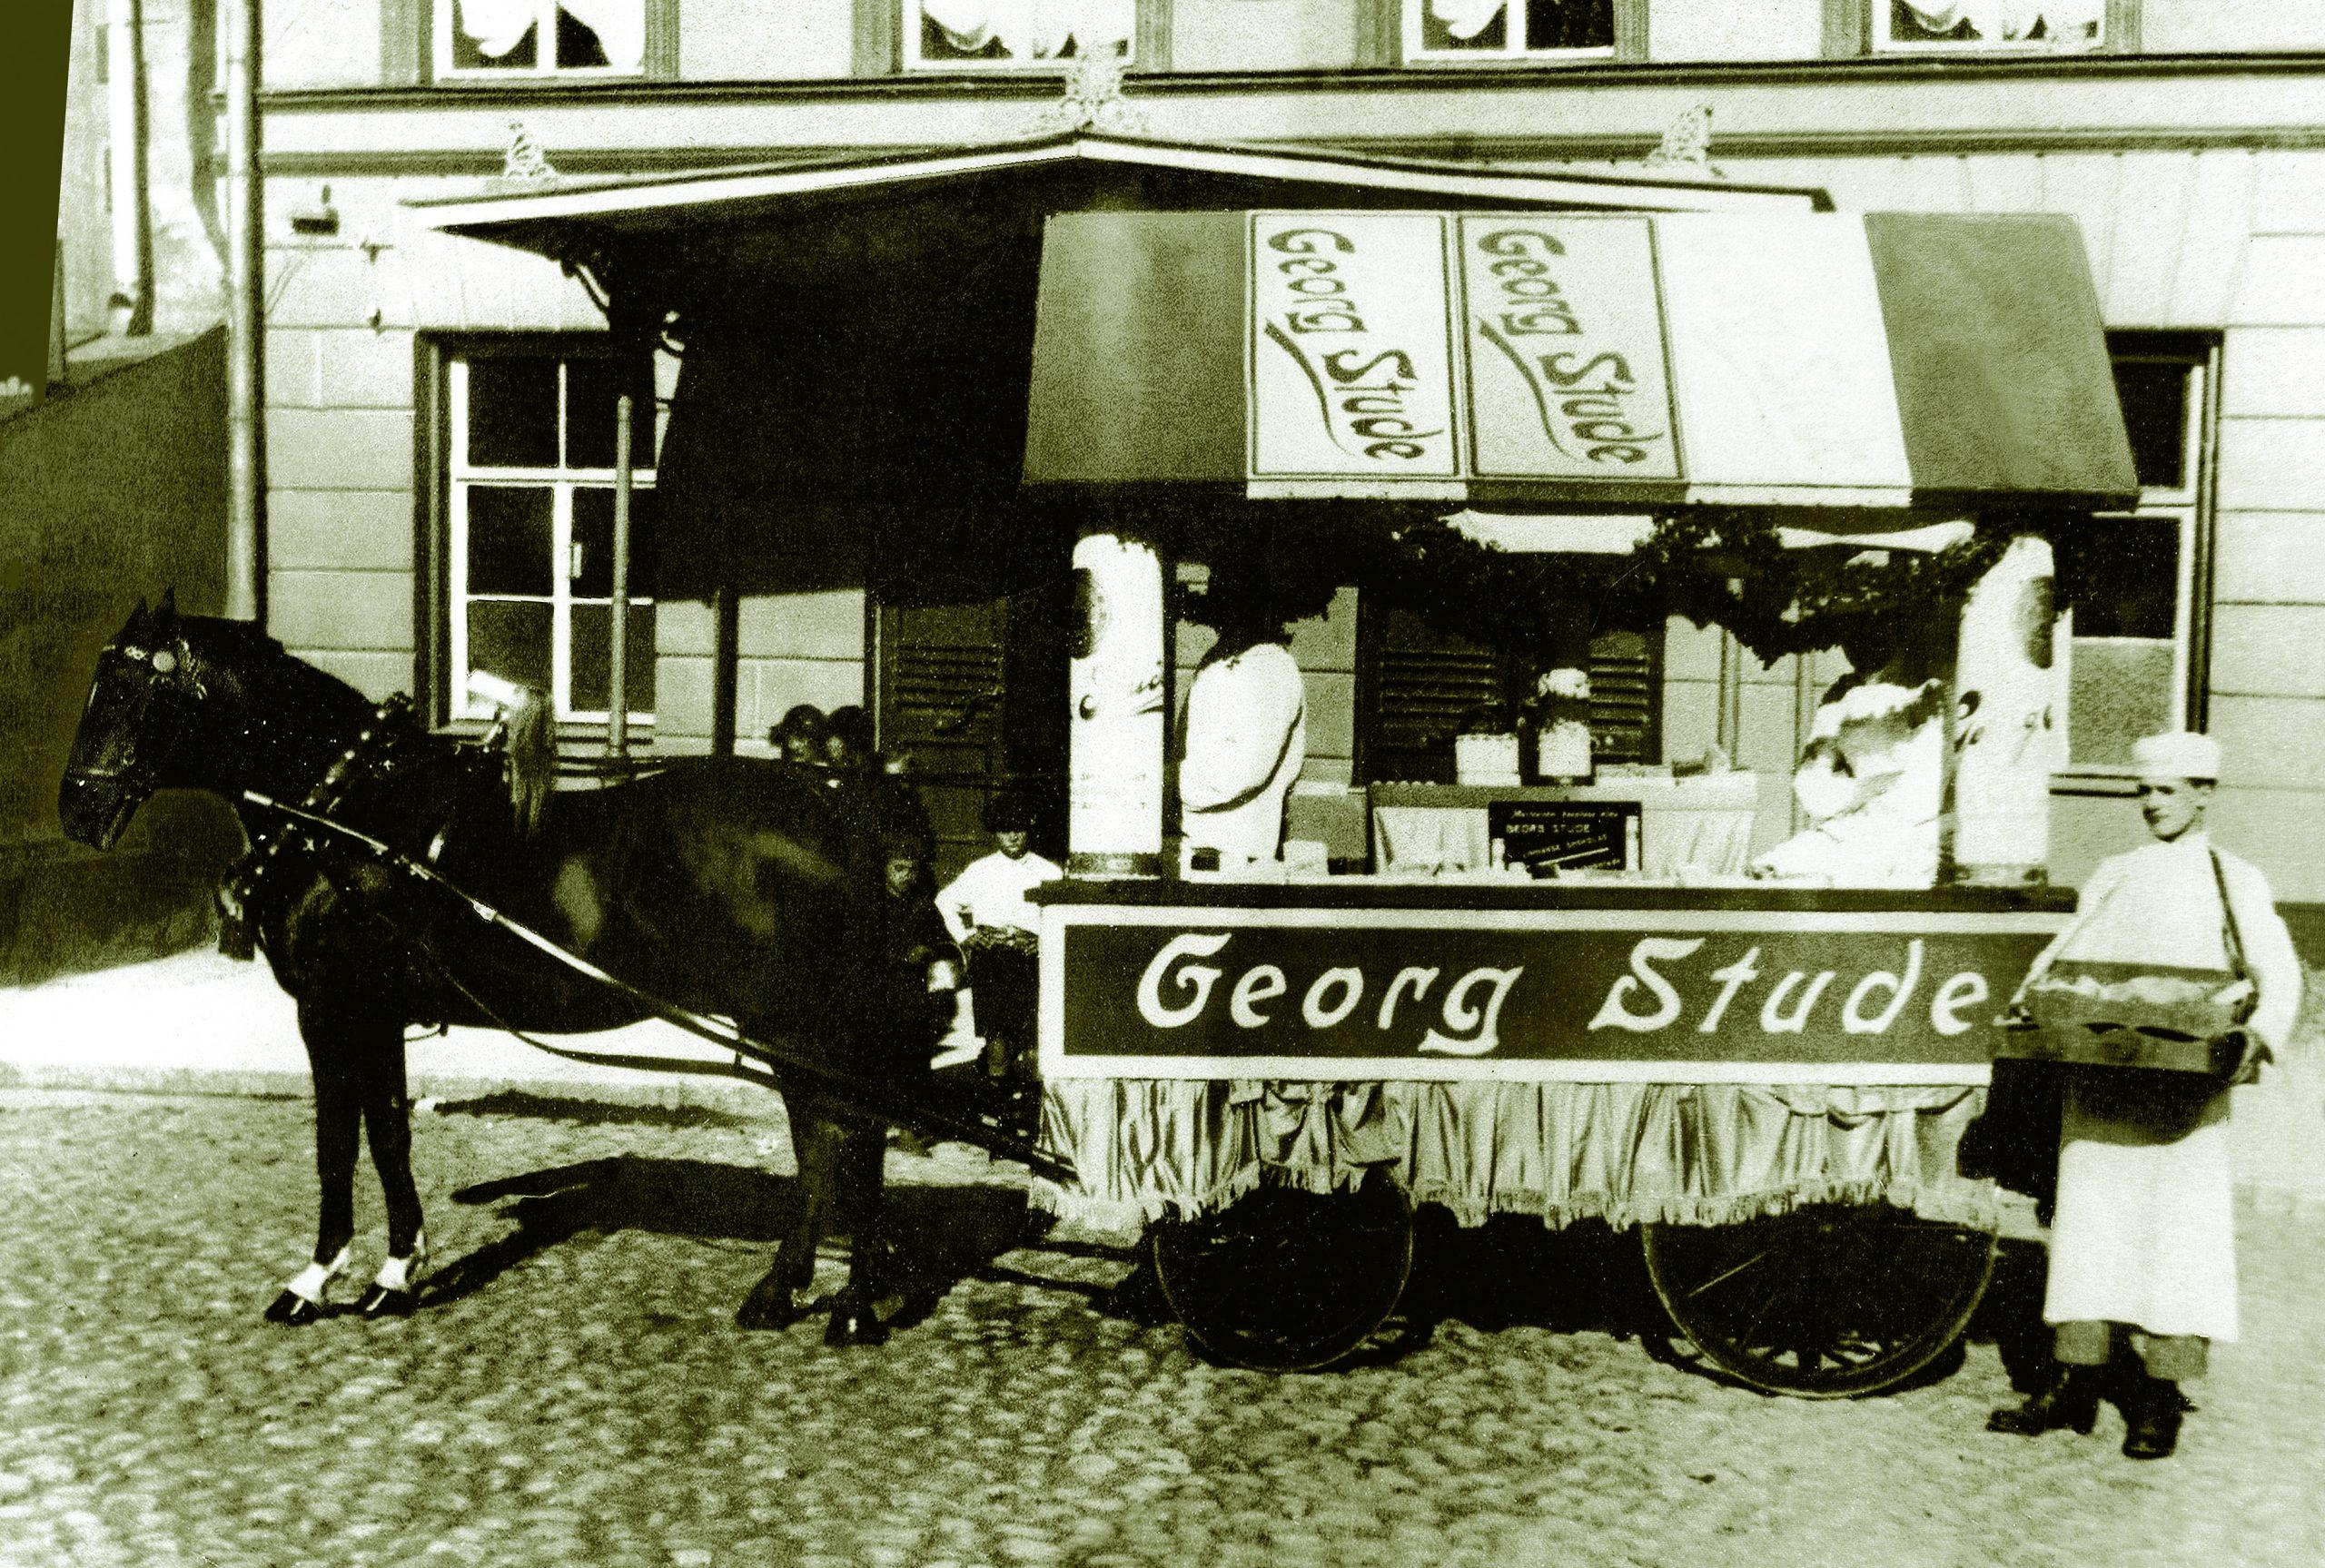 Geaorg Stude kohvik